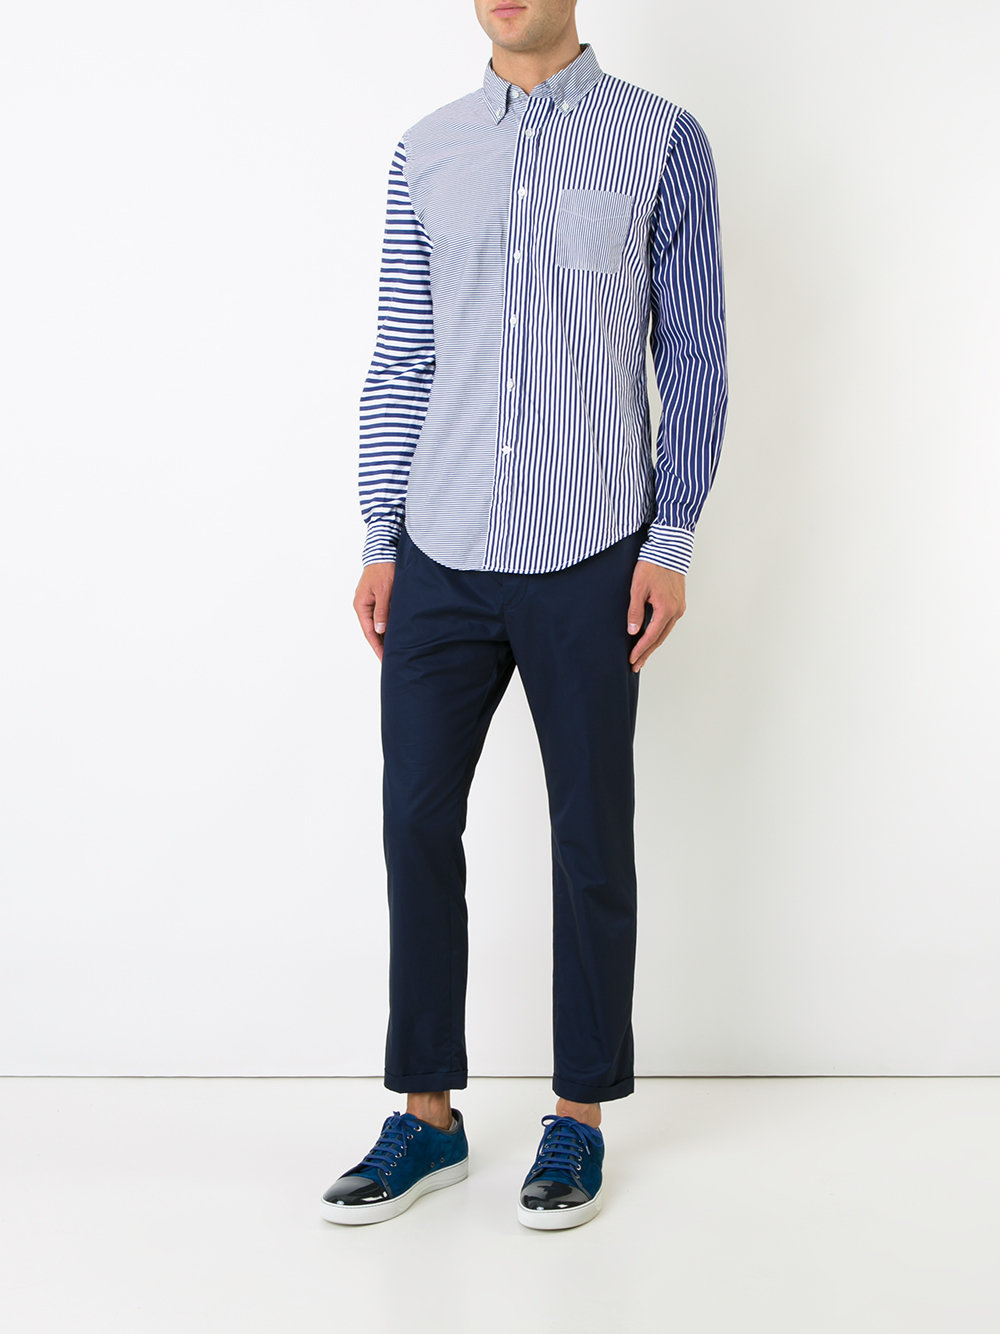 patchwork striped shirt